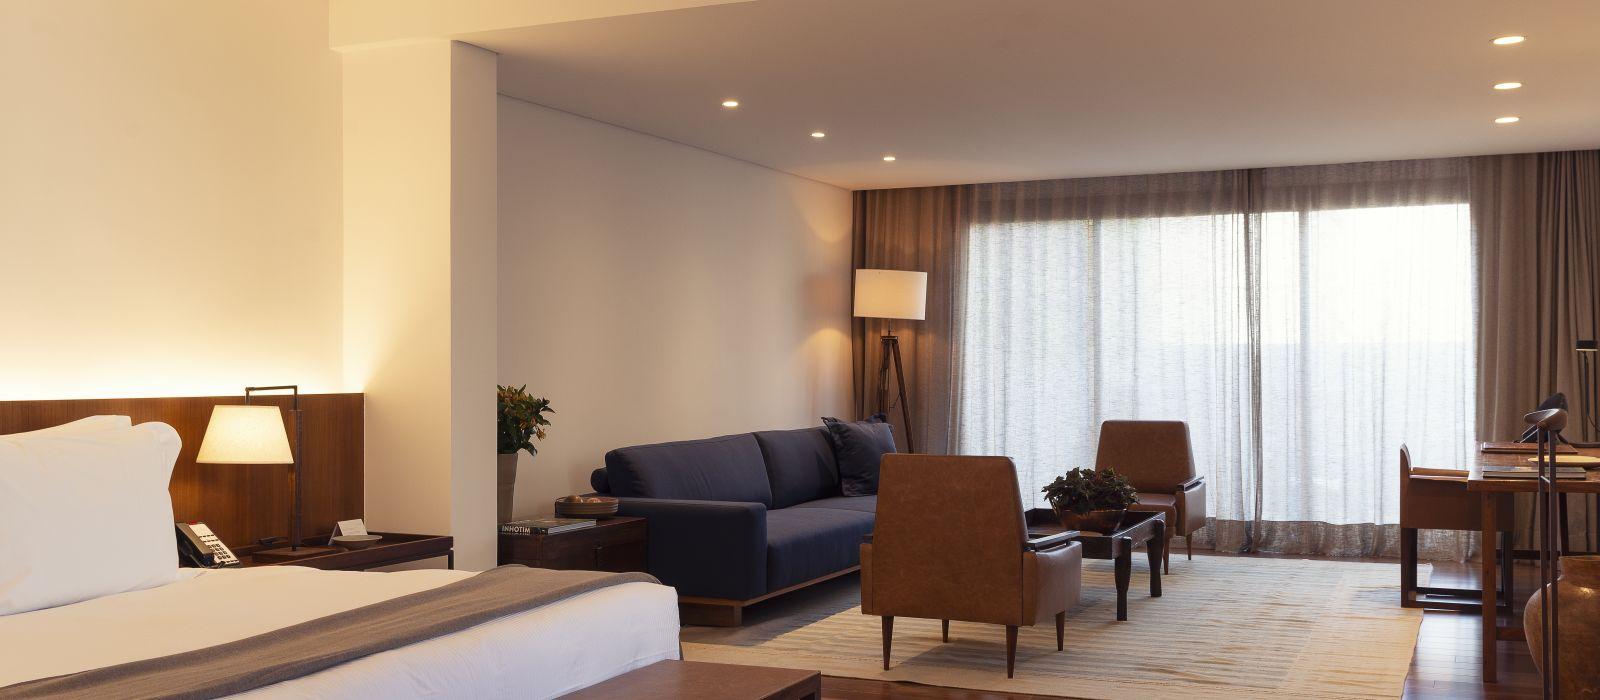 Hotel Fasano Belo Horizonte Brazil